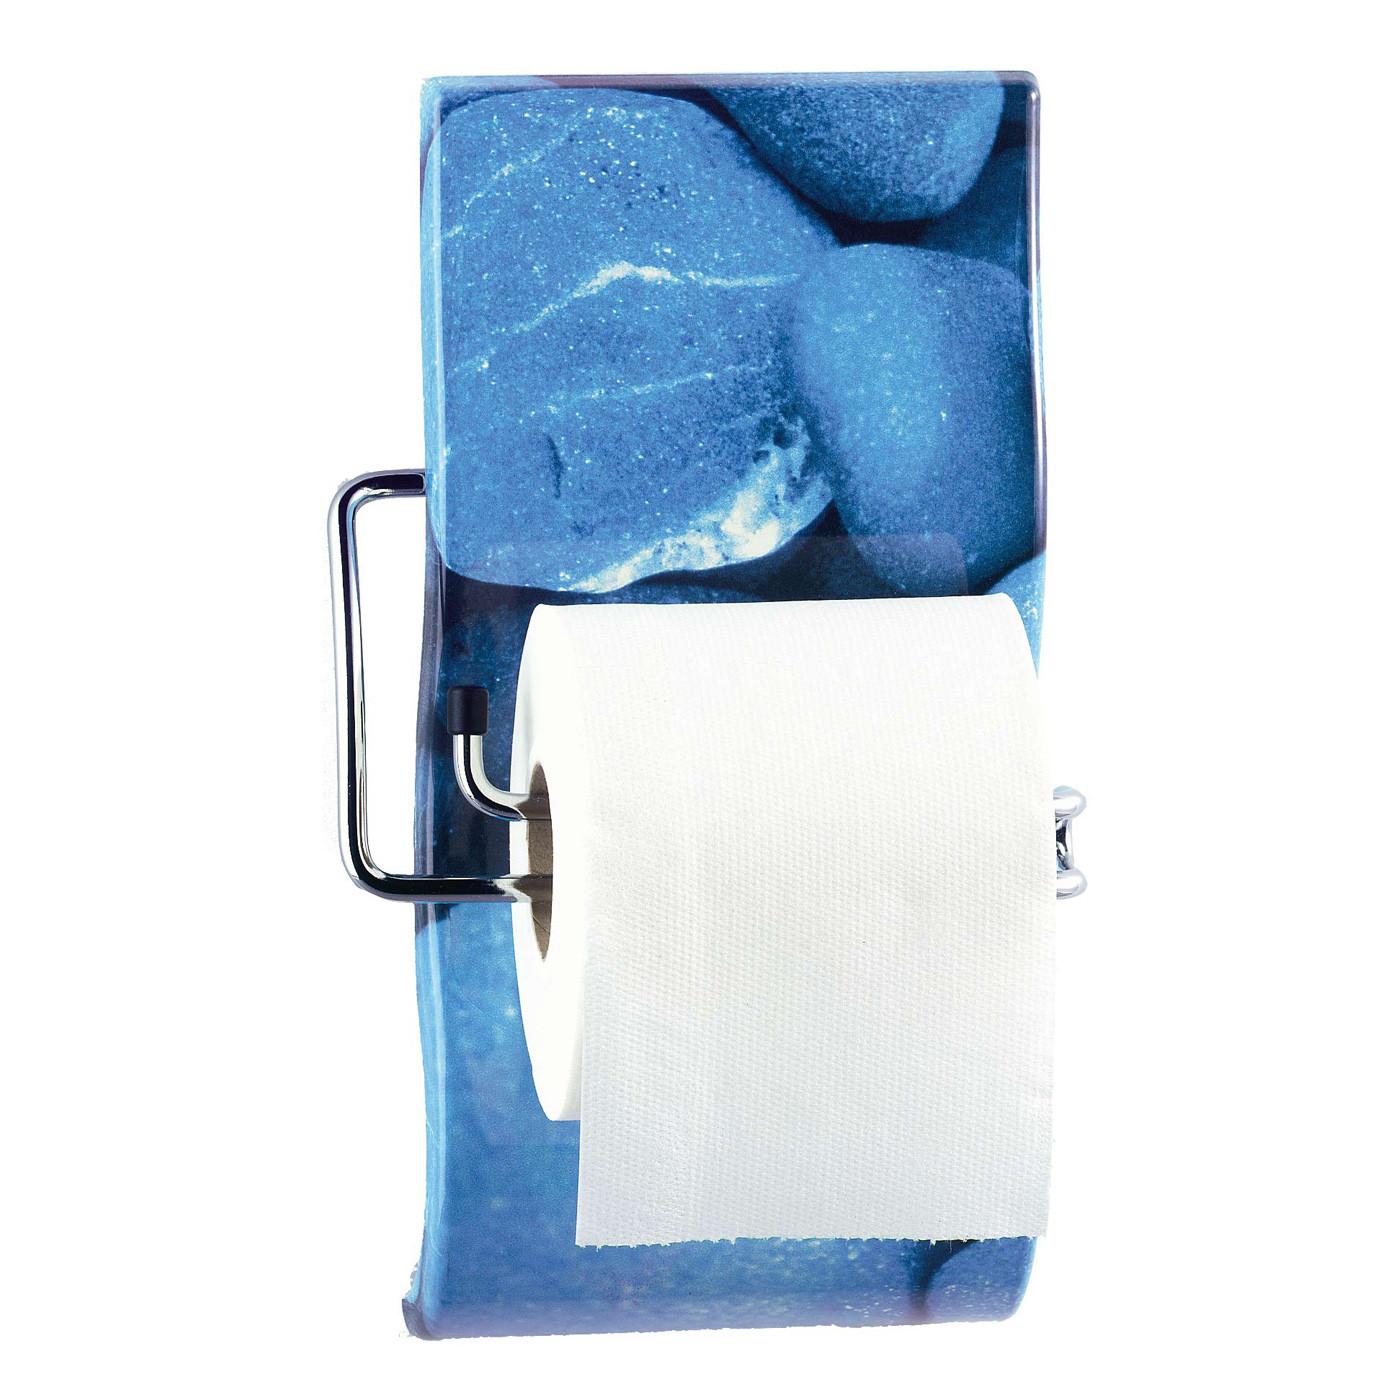 Accessoires wc galets 083428 ontwerp for Accessoires wc